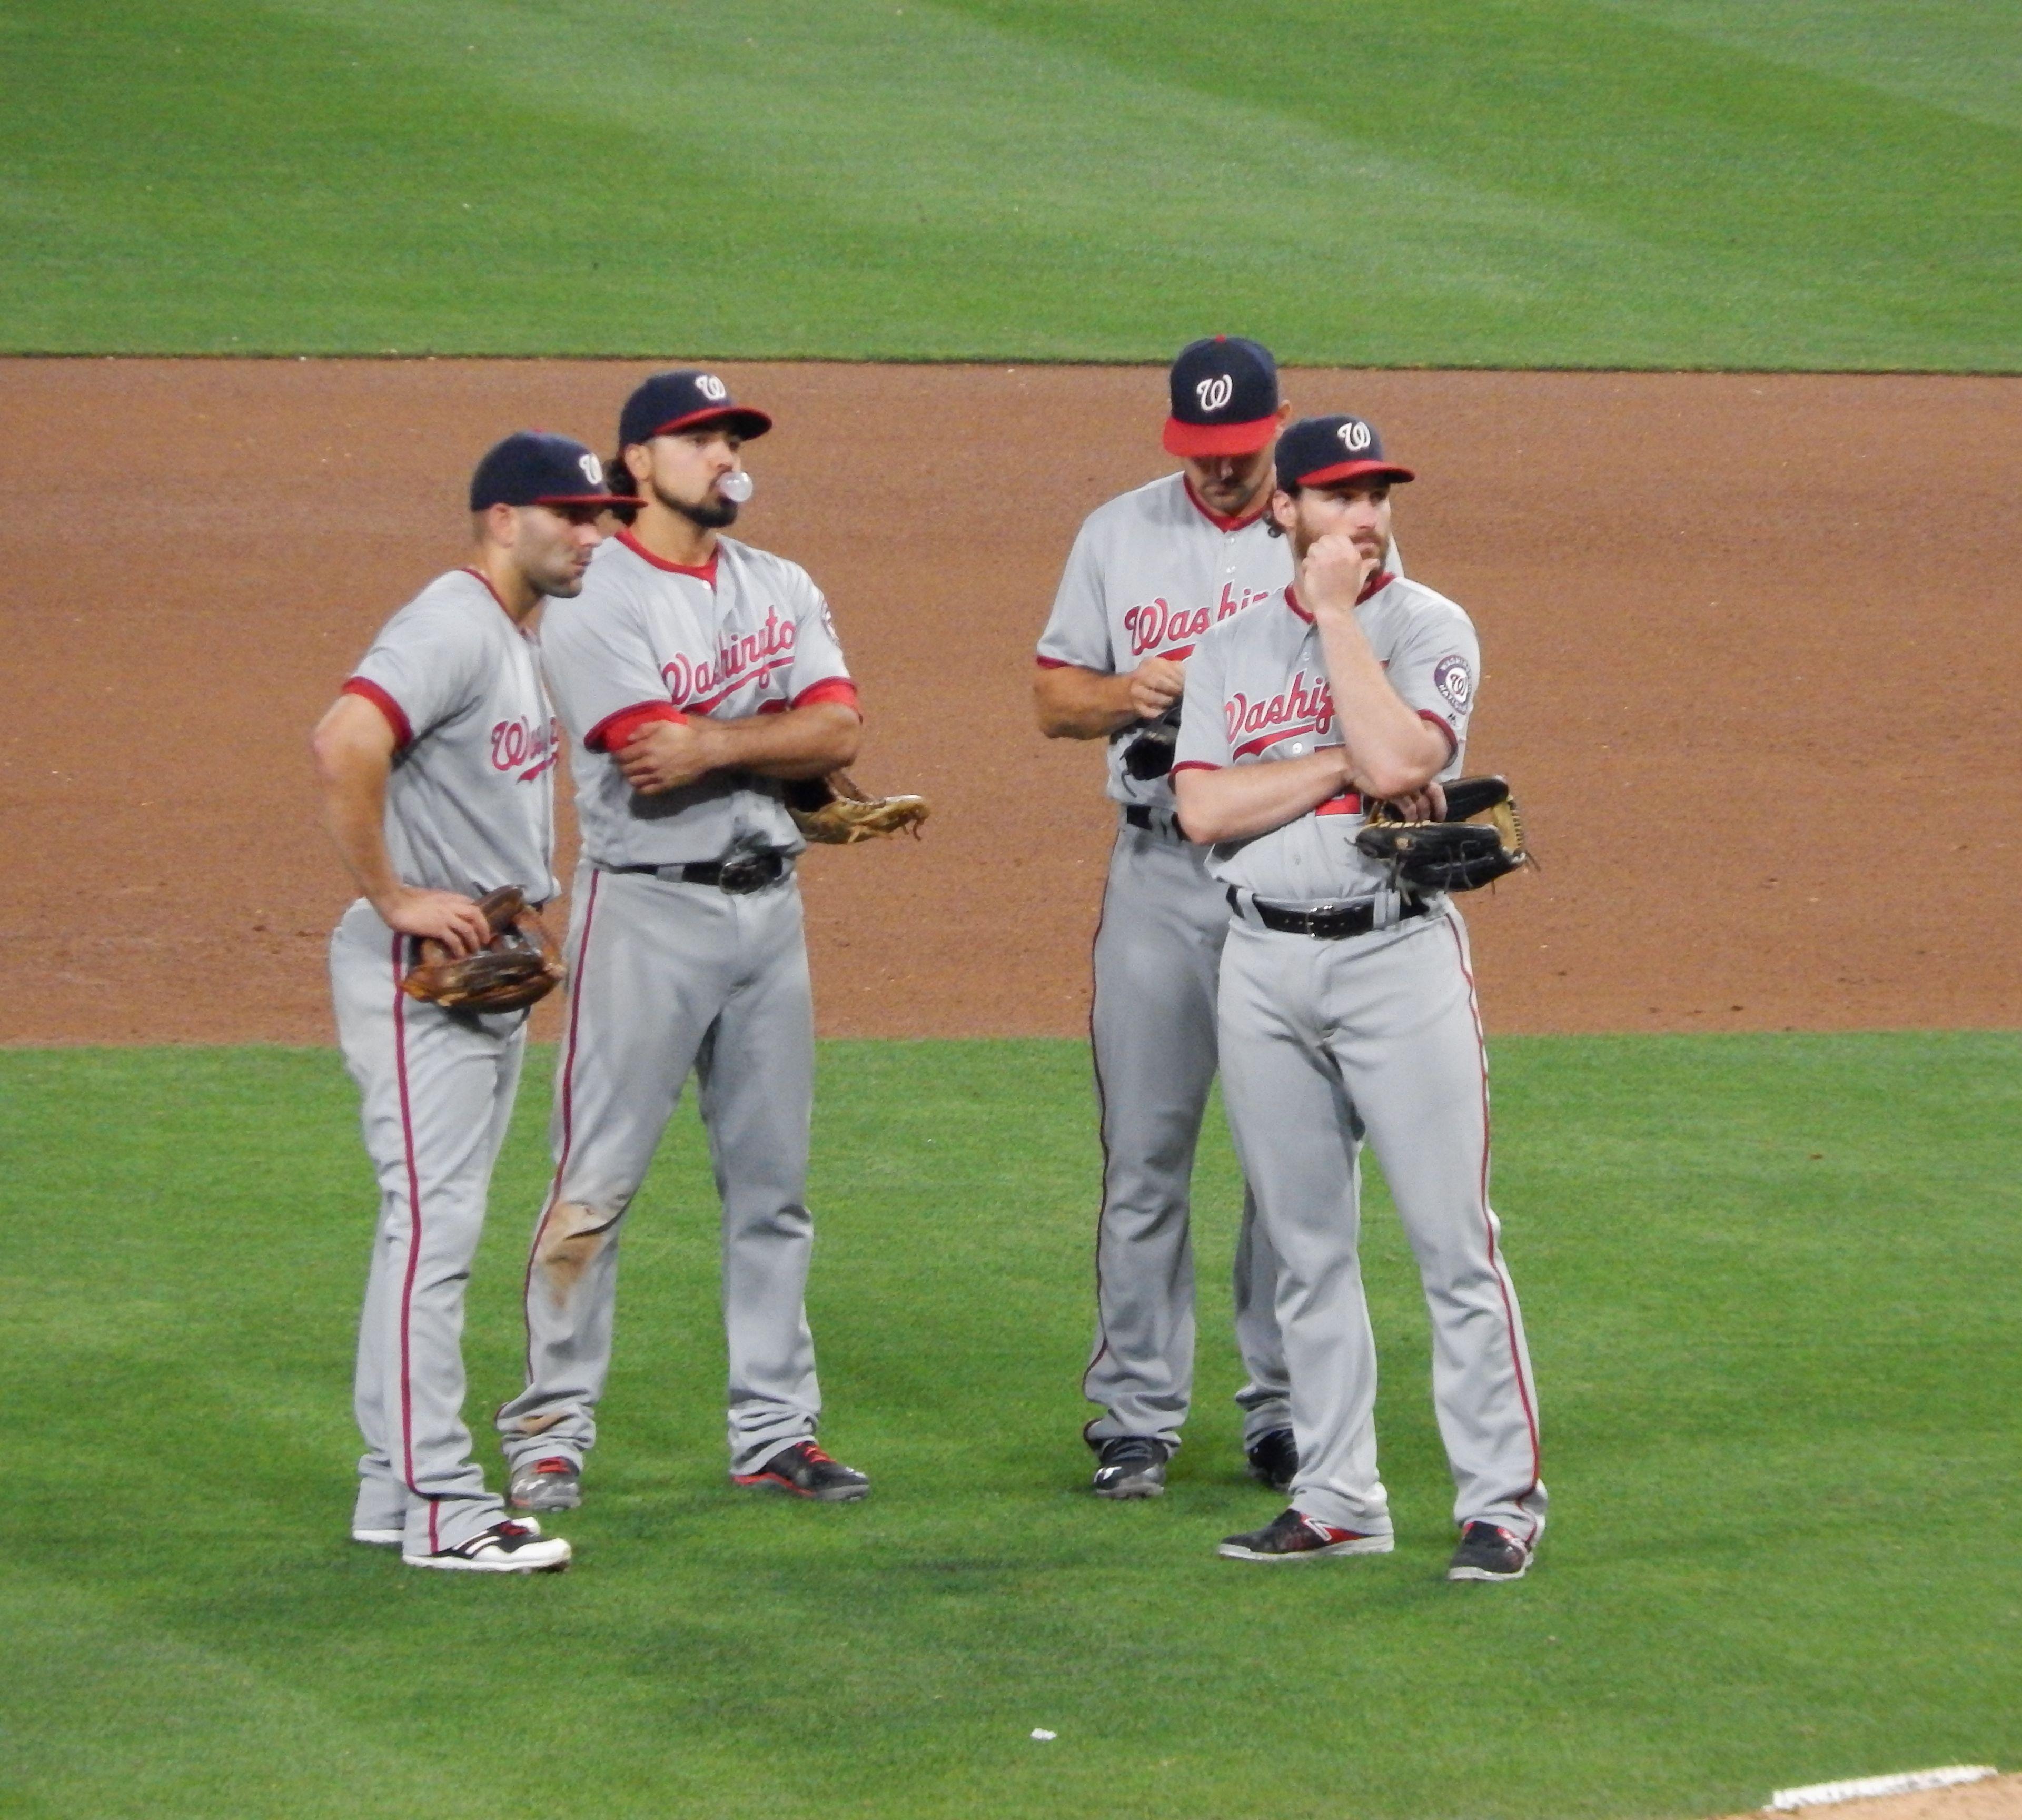 Serie SD Padres vs Washington Nationals 17 junio 2016.